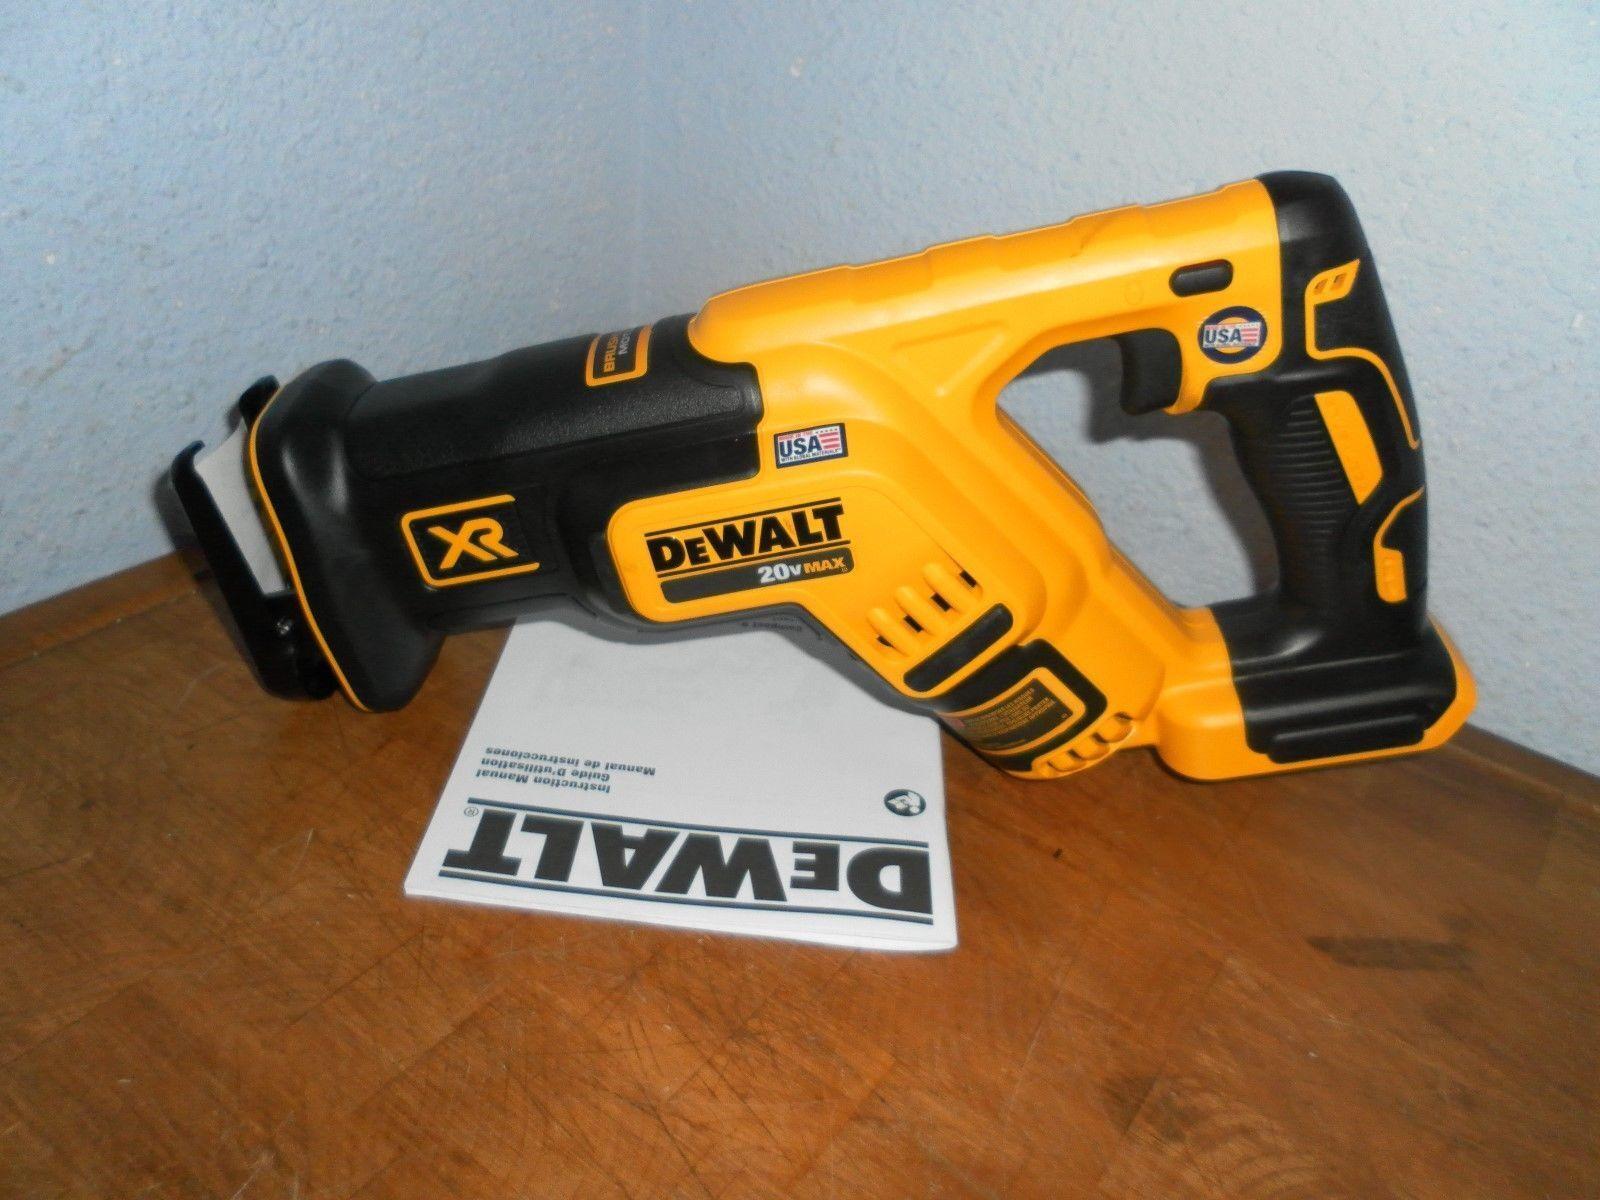 Dewalt DCS367  DCS367B 20V Max XR Brushless Compact Reciprocating Saw